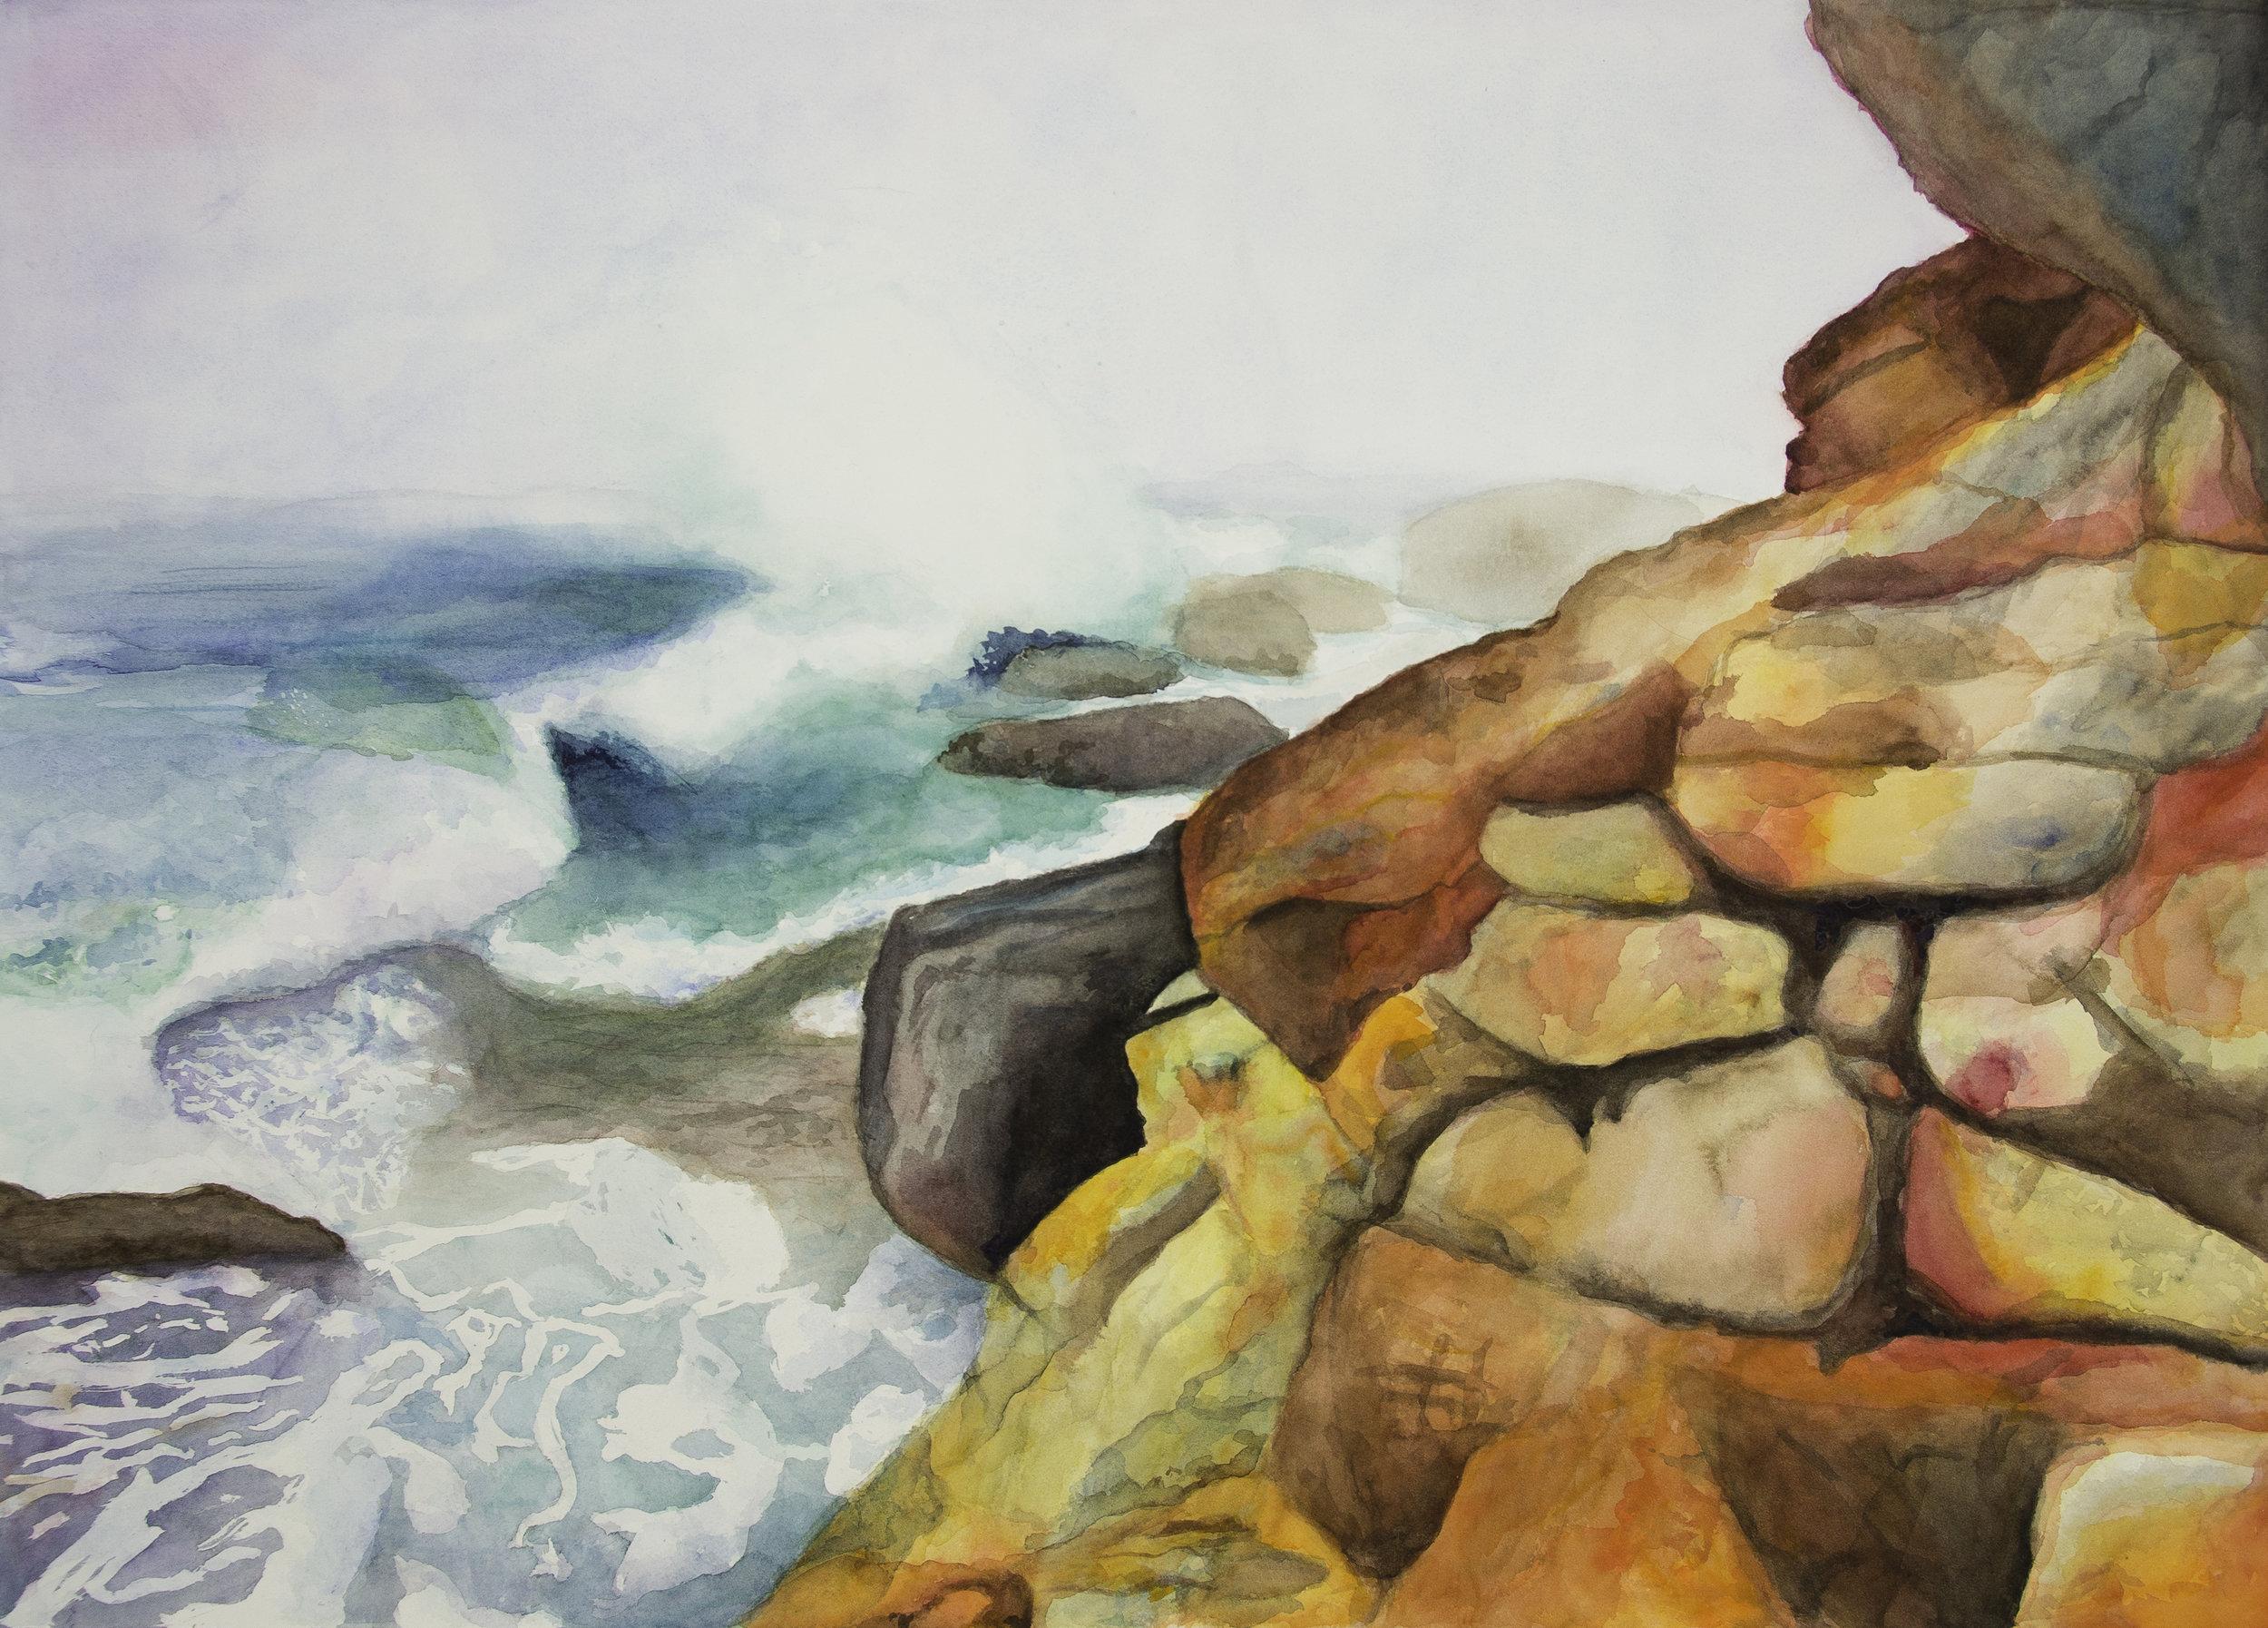 Olivia McCants_Seaside Watercolor_8inShortSide-300ppi.jpg